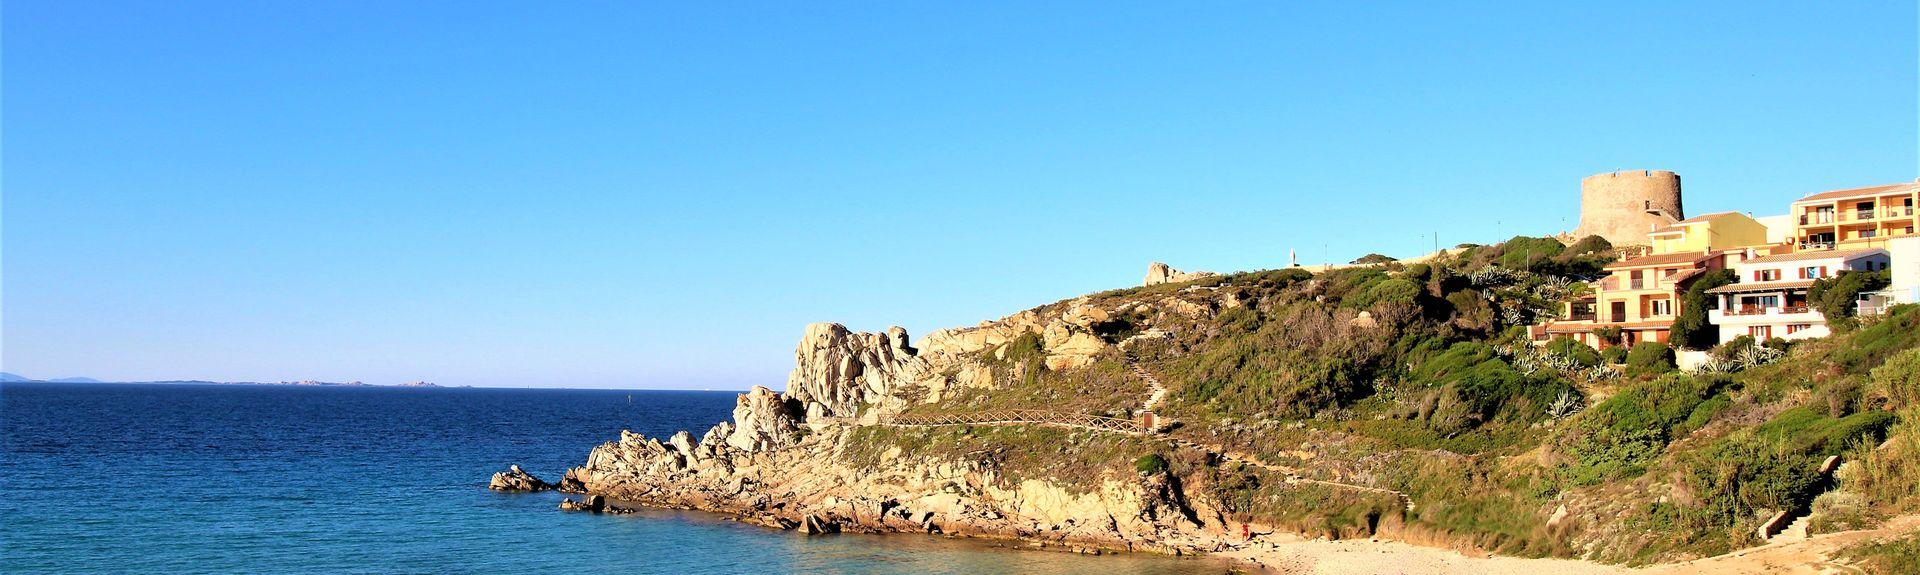 Terravecchia-portoquadro, Sassari, Sardinia, Italy